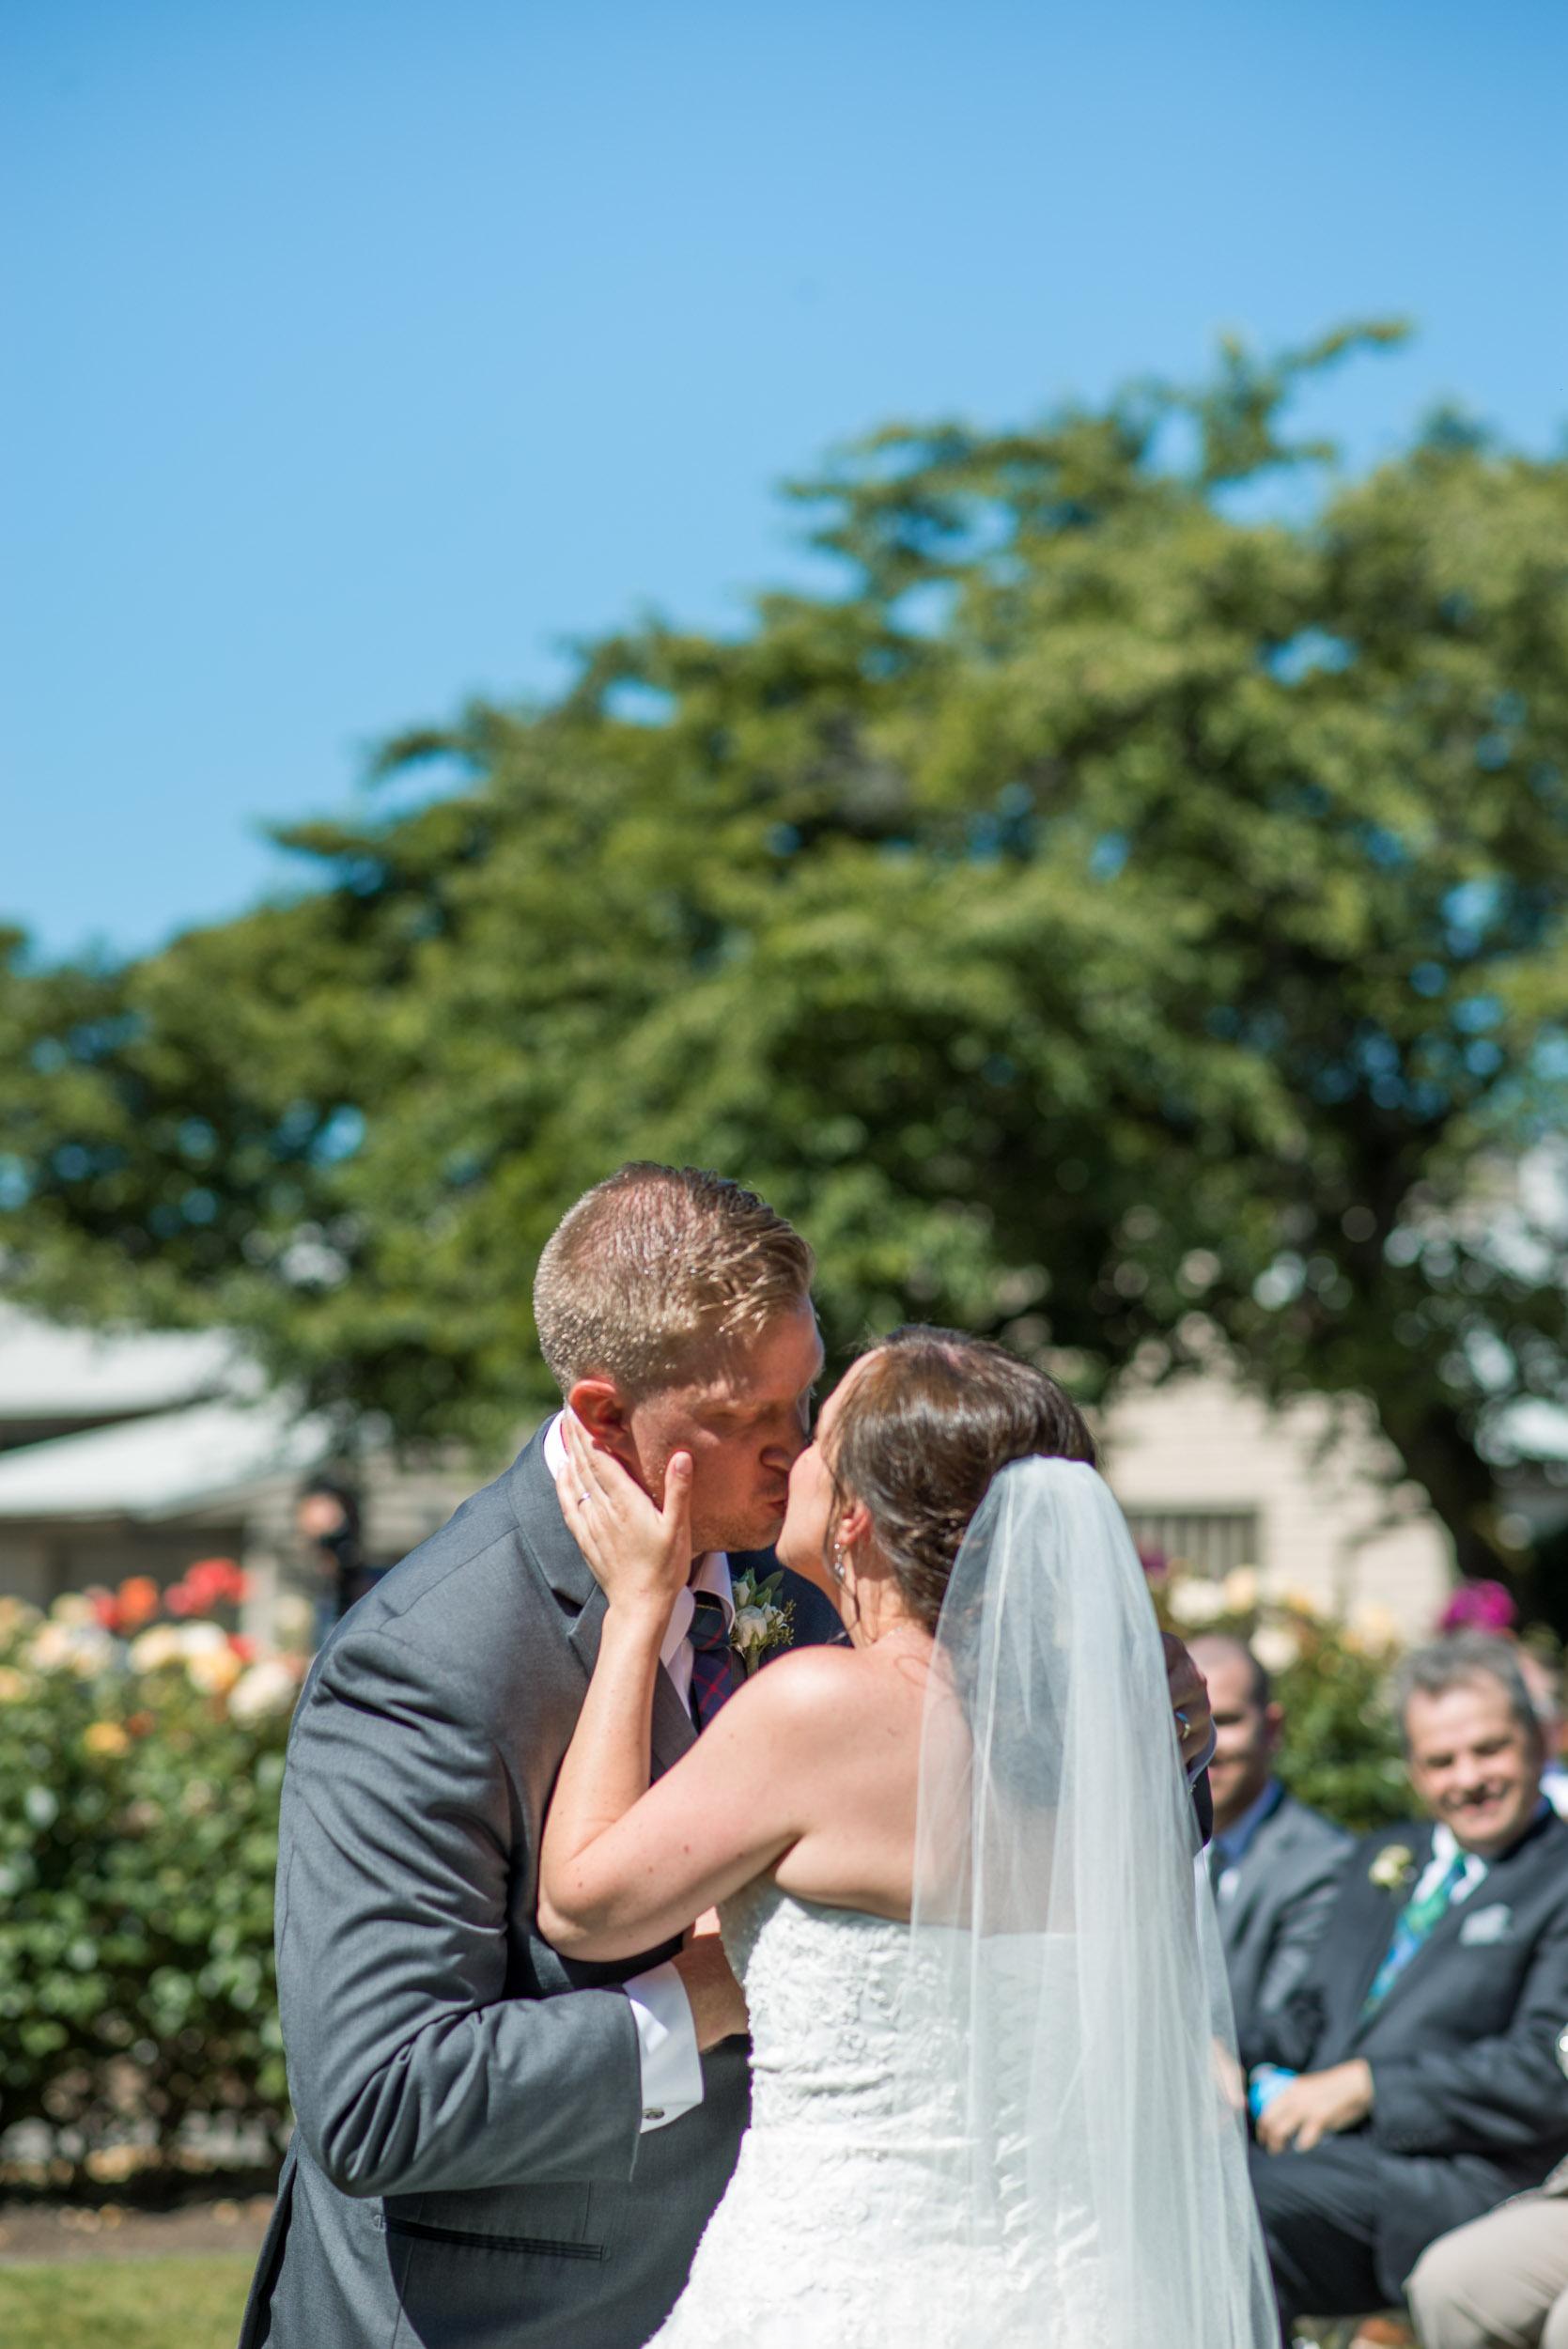 Wedding ceremony in rose garden first kiss